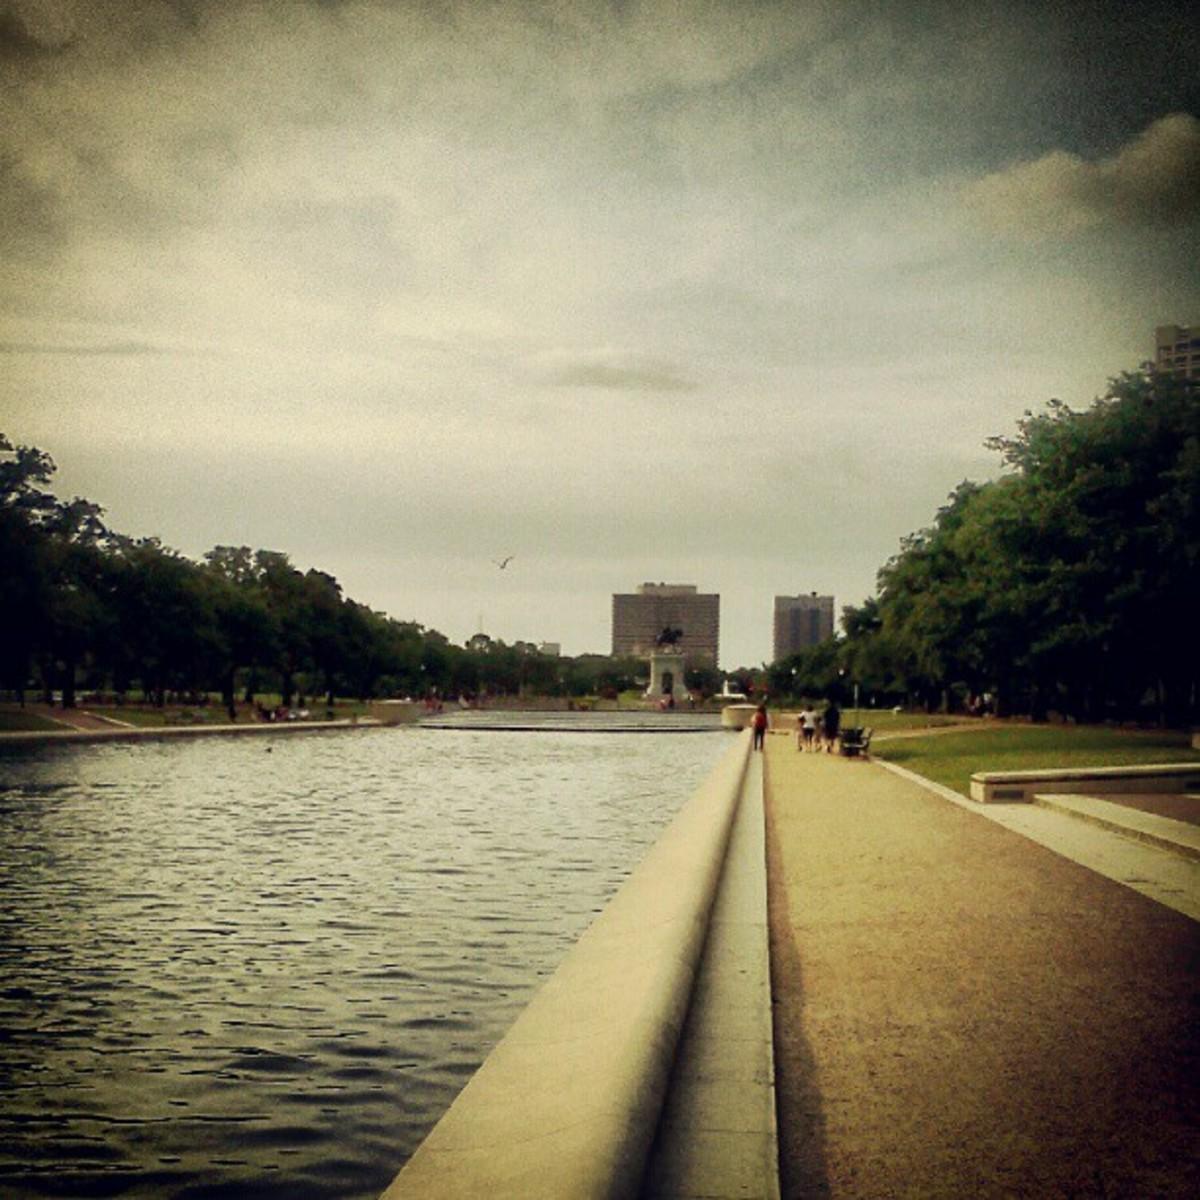 Hermann Park Pool